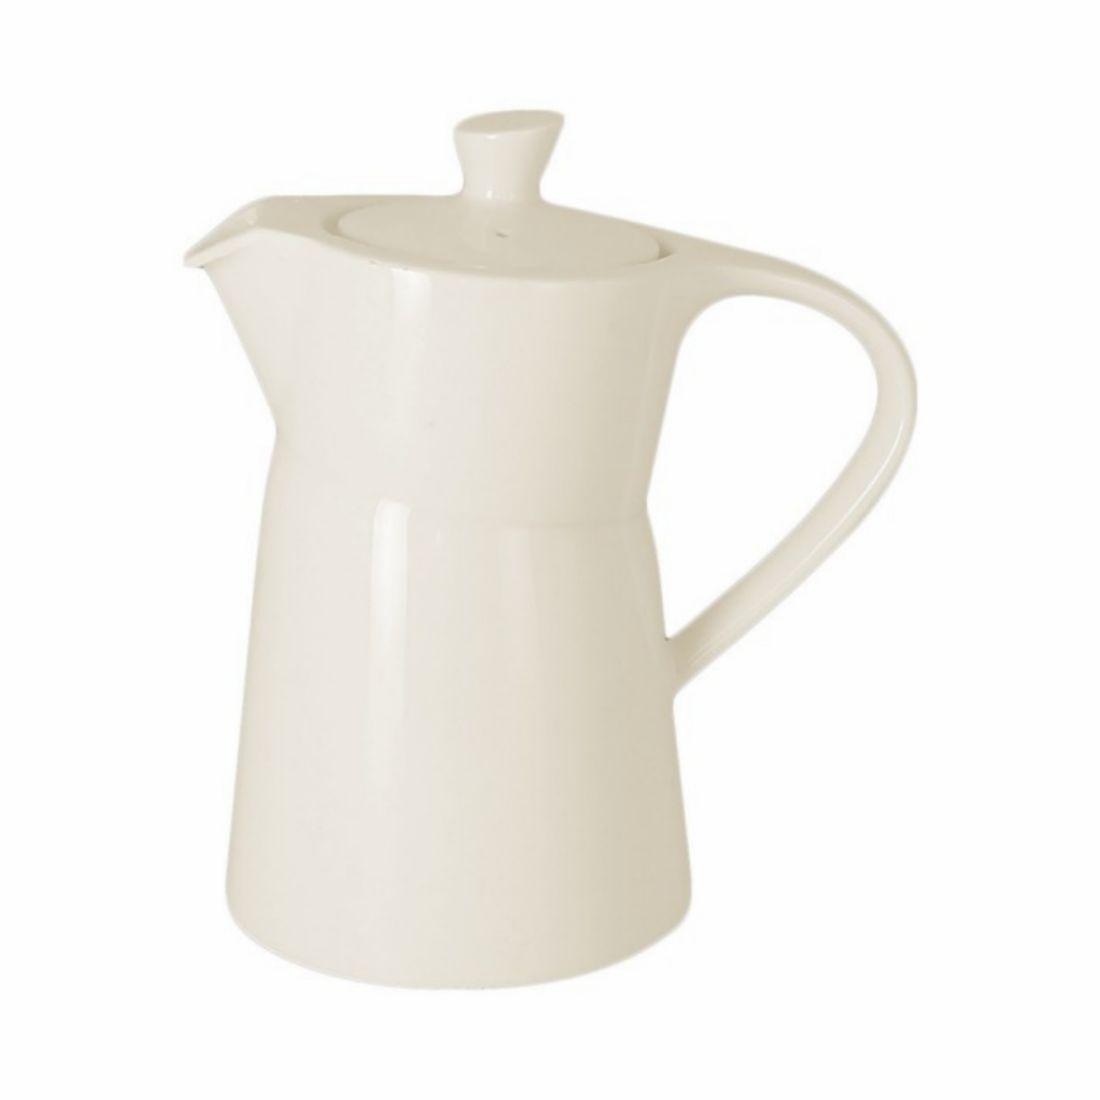 Víčko ke konvici na kávu Giro 350 ml